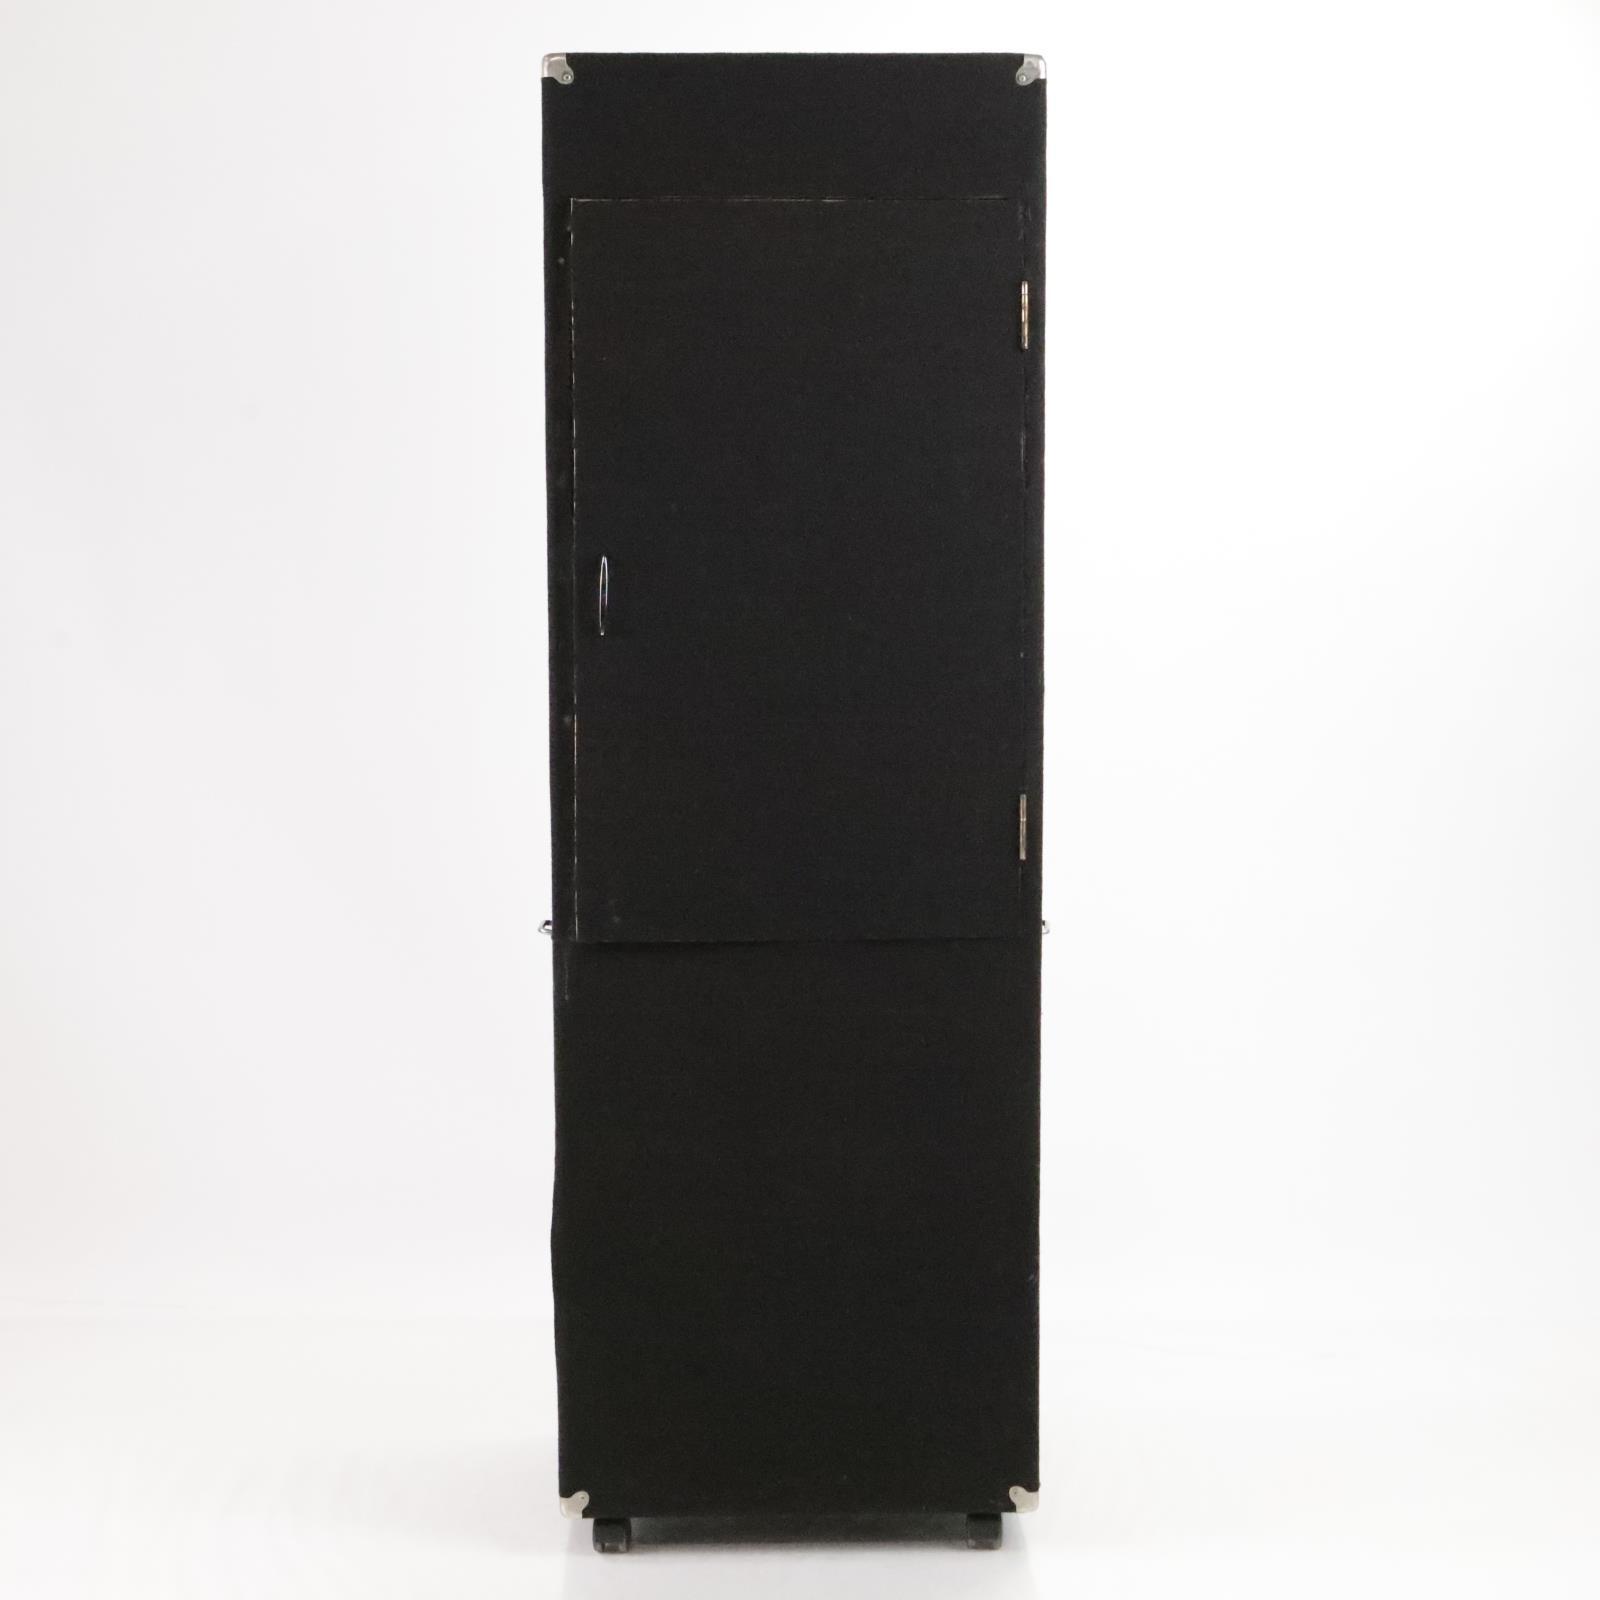 Custom Guitar Isolation Iso Box Booth w/ 2 Celestion G12T-75 Speakers #36418